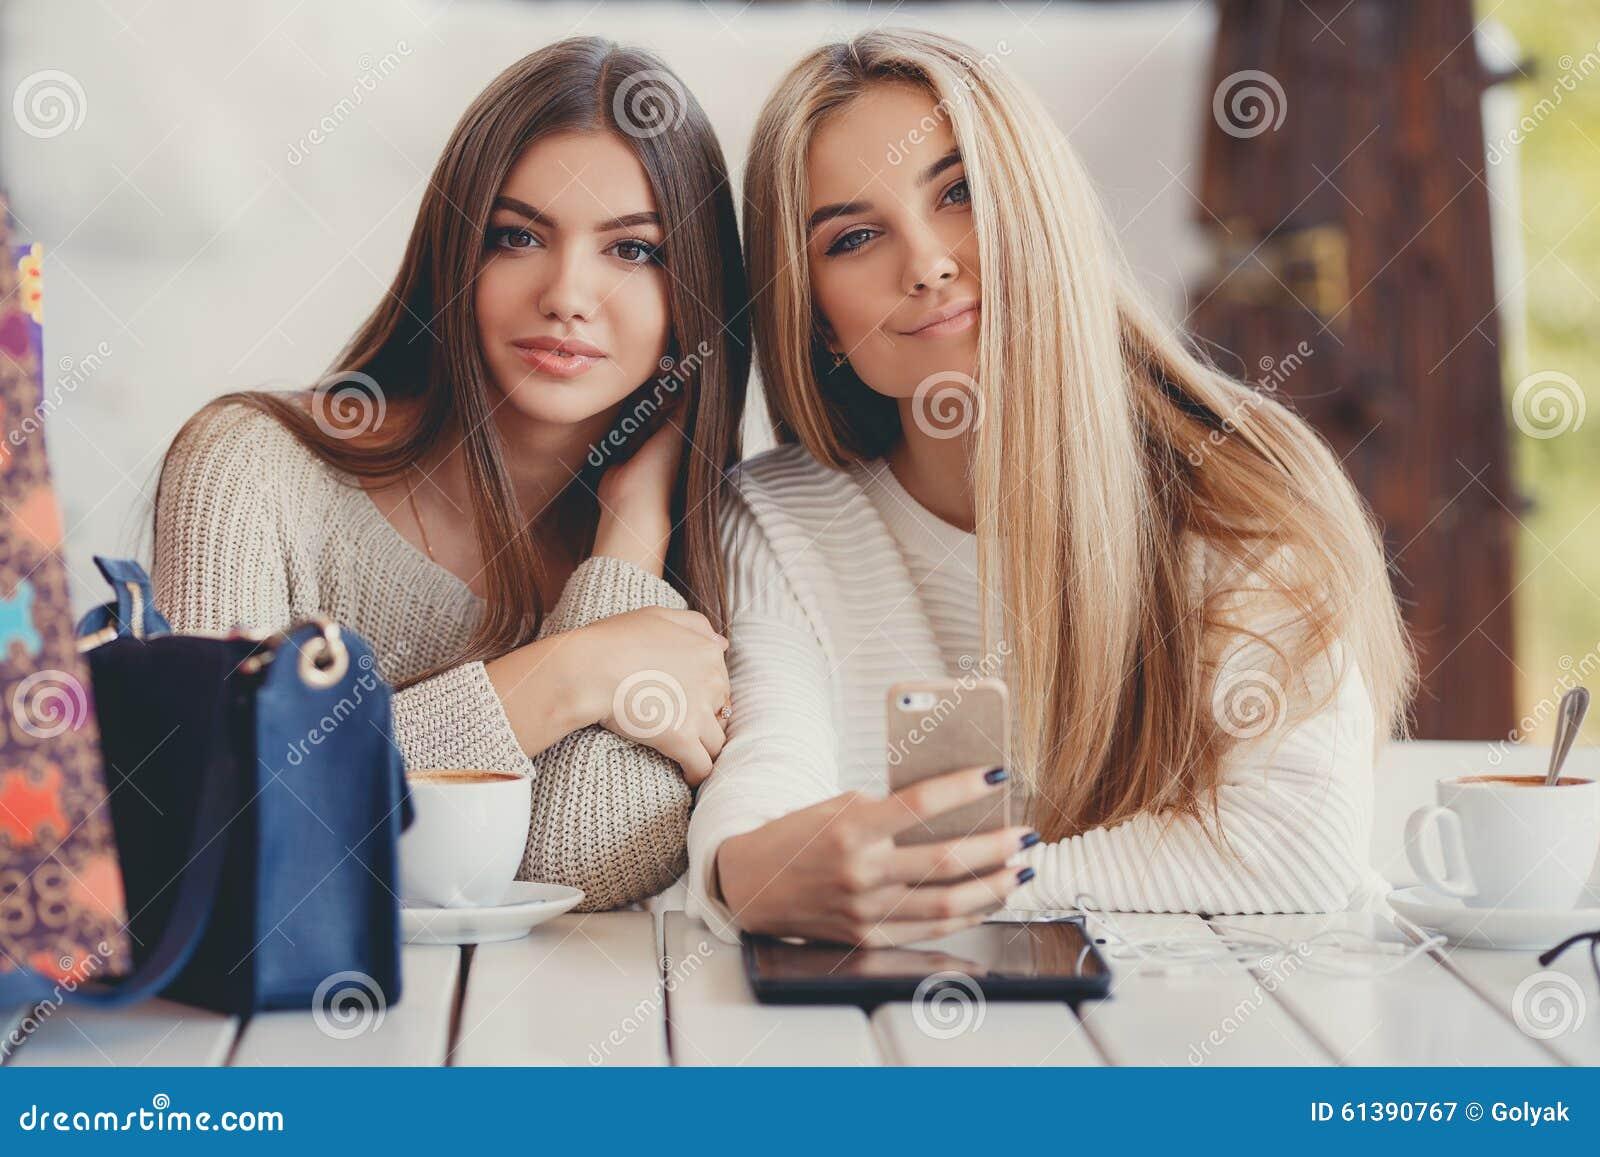 Cinnabuns and blonde friend